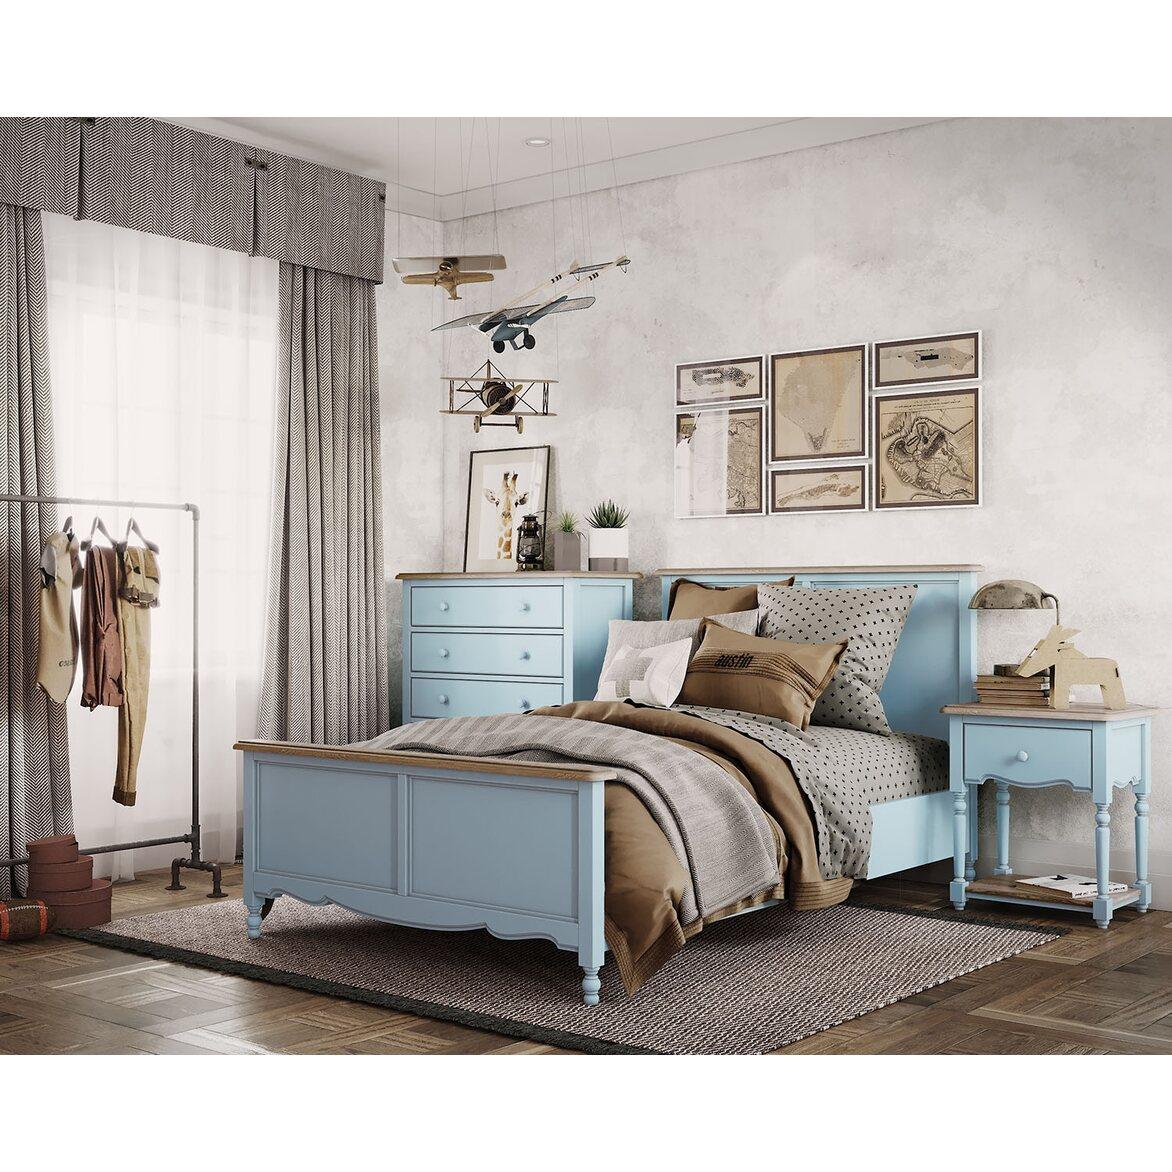 Шкаф двухстворчатый Leblanc, голубой 6 | Платяные шкафы Kingsby